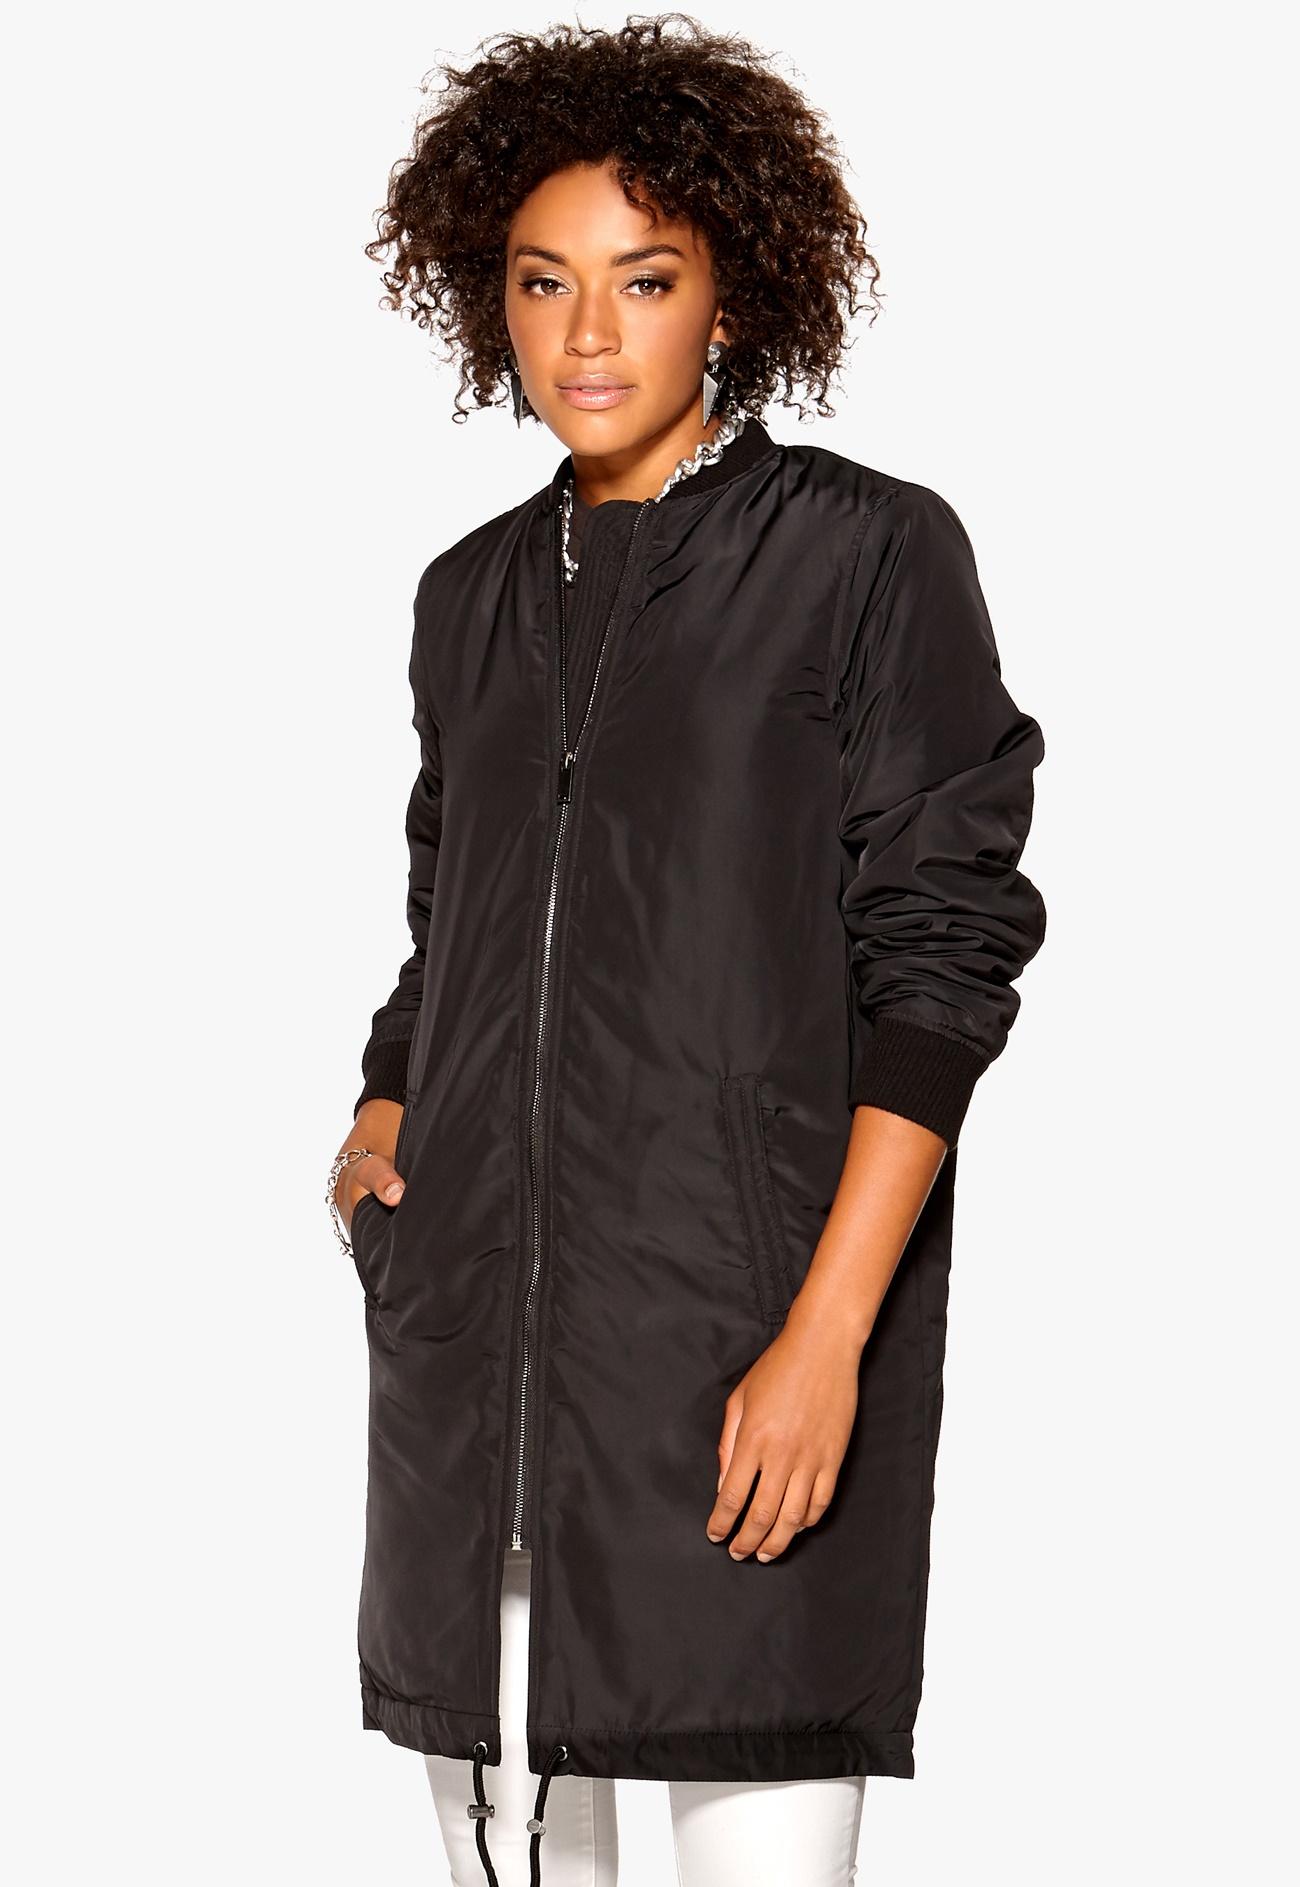 vero moda linea 3 4 jacket black bubbleroom. Black Bedroom Furniture Sets. Home Design Ideas